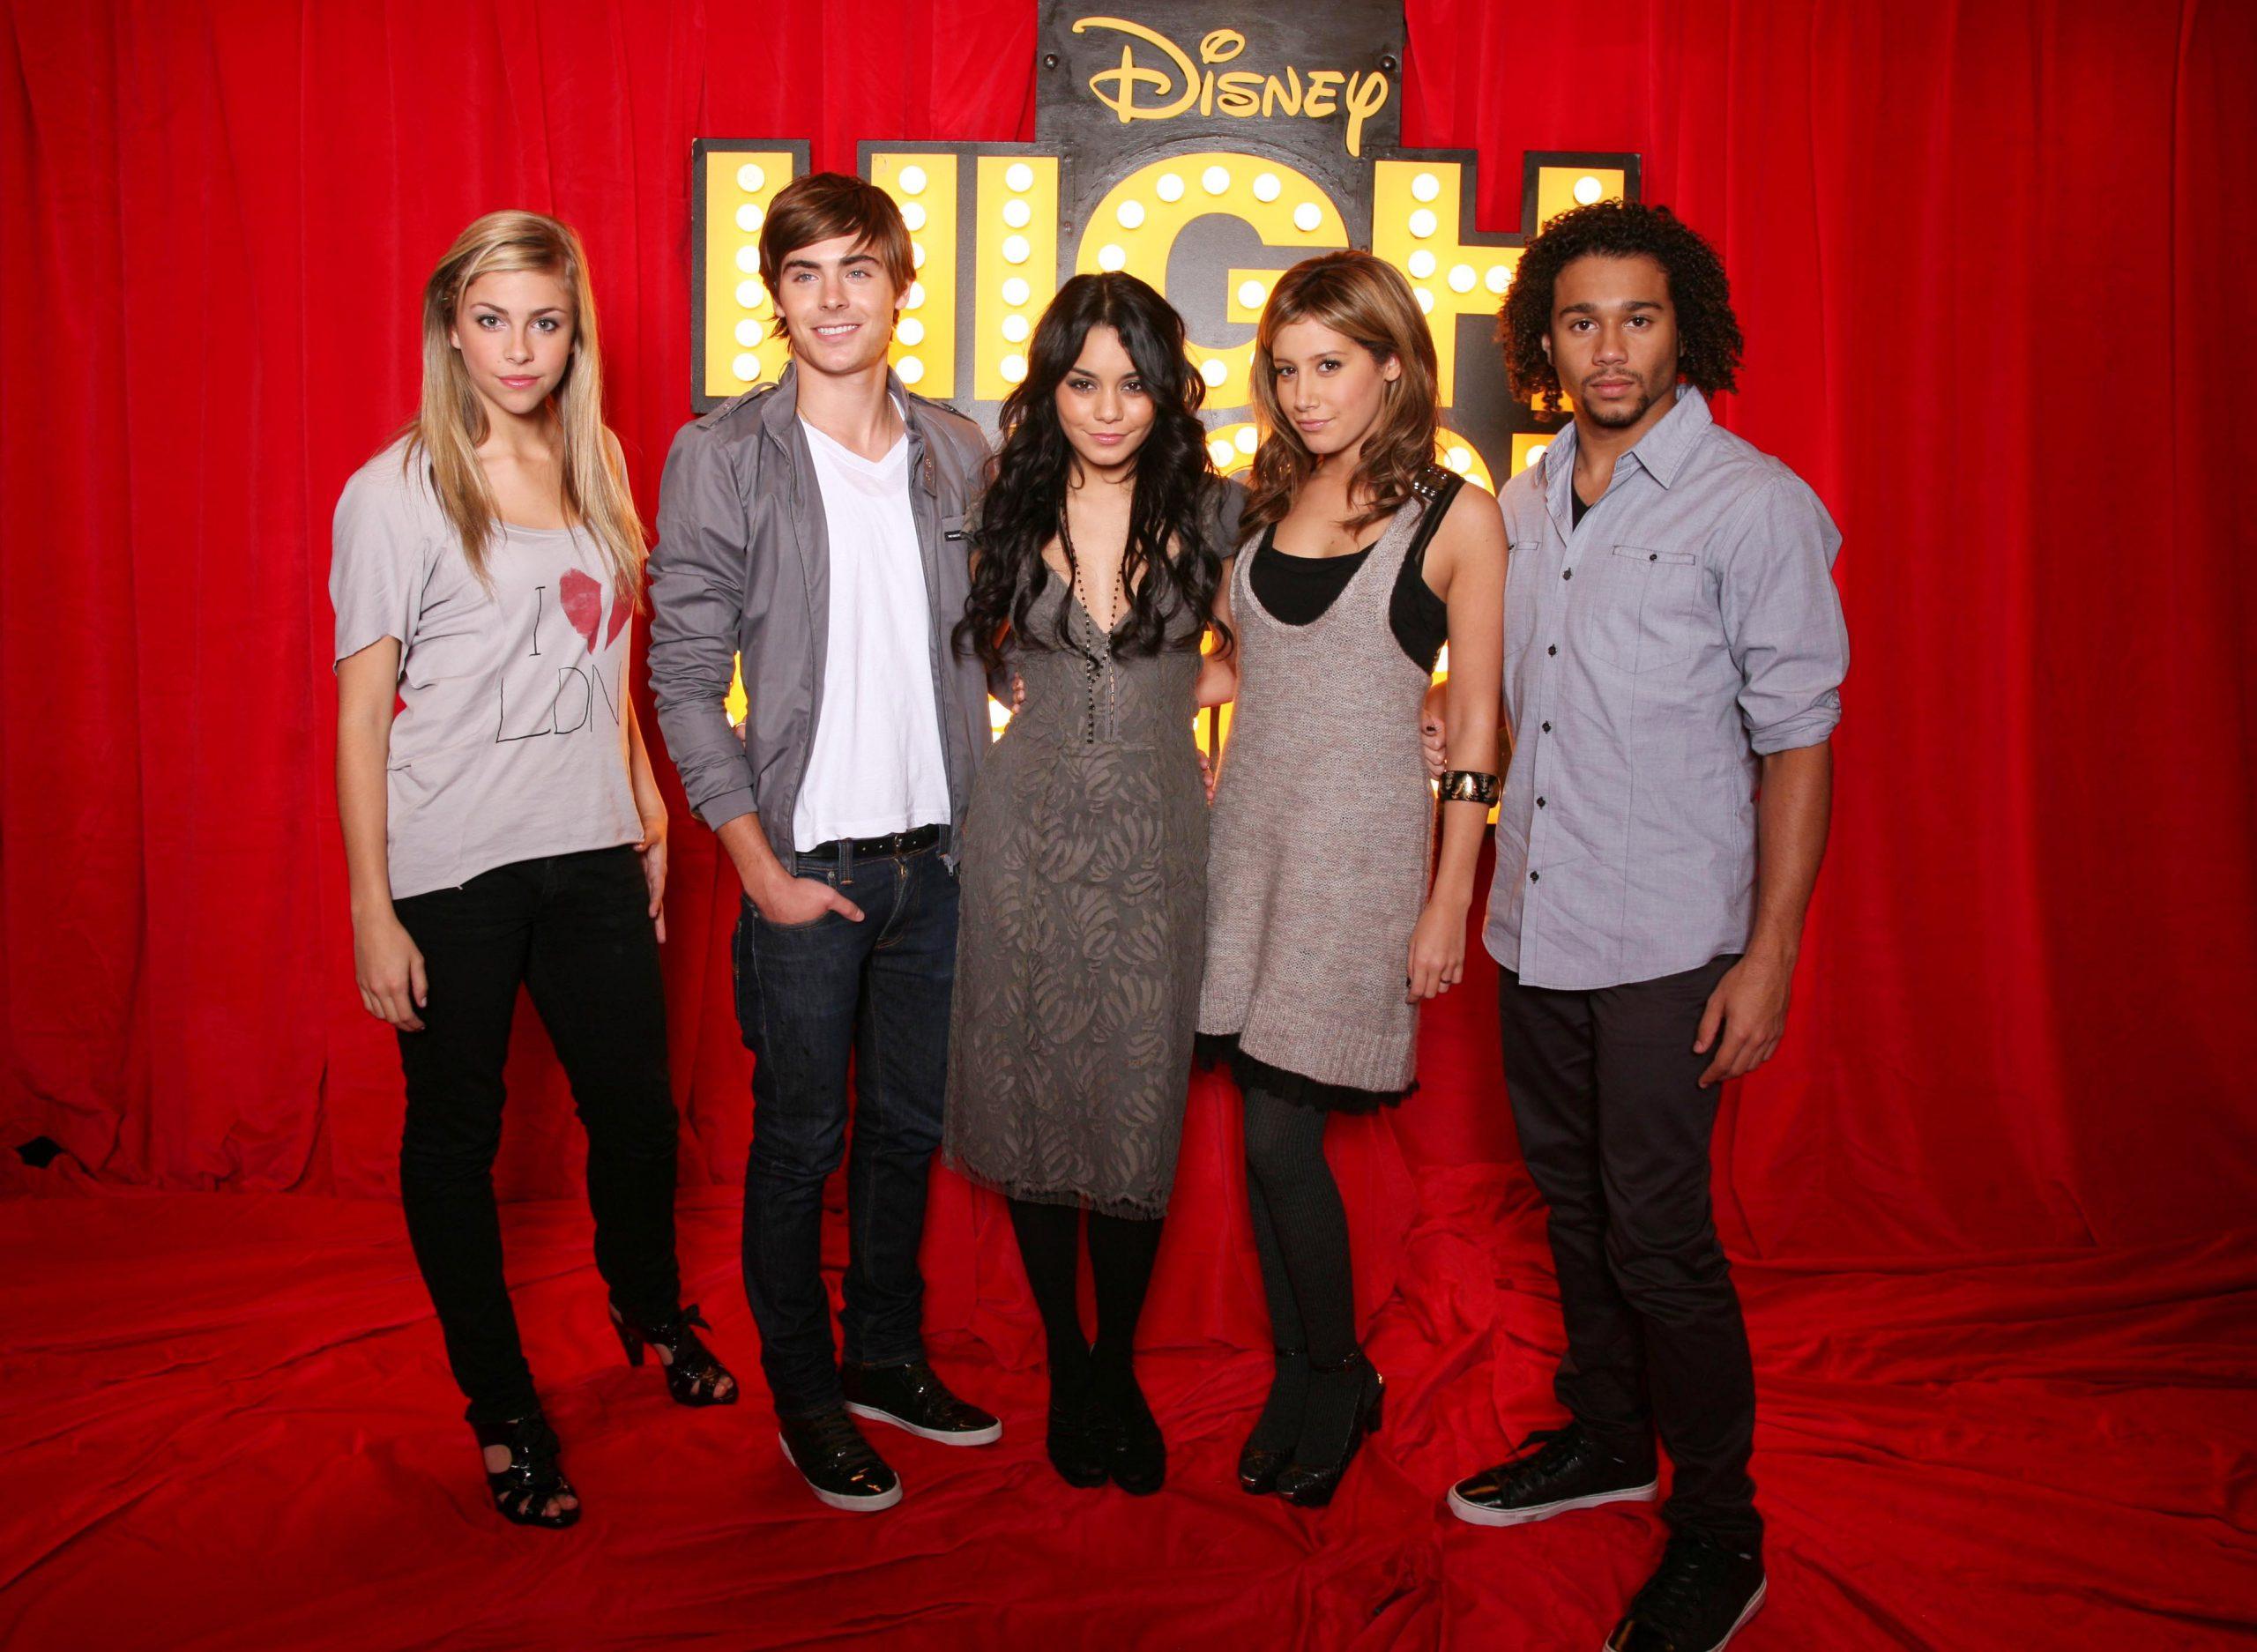 High School Musical 3' Dances Away With Box Office Again verwandt mit High School Musical Senior Year Online